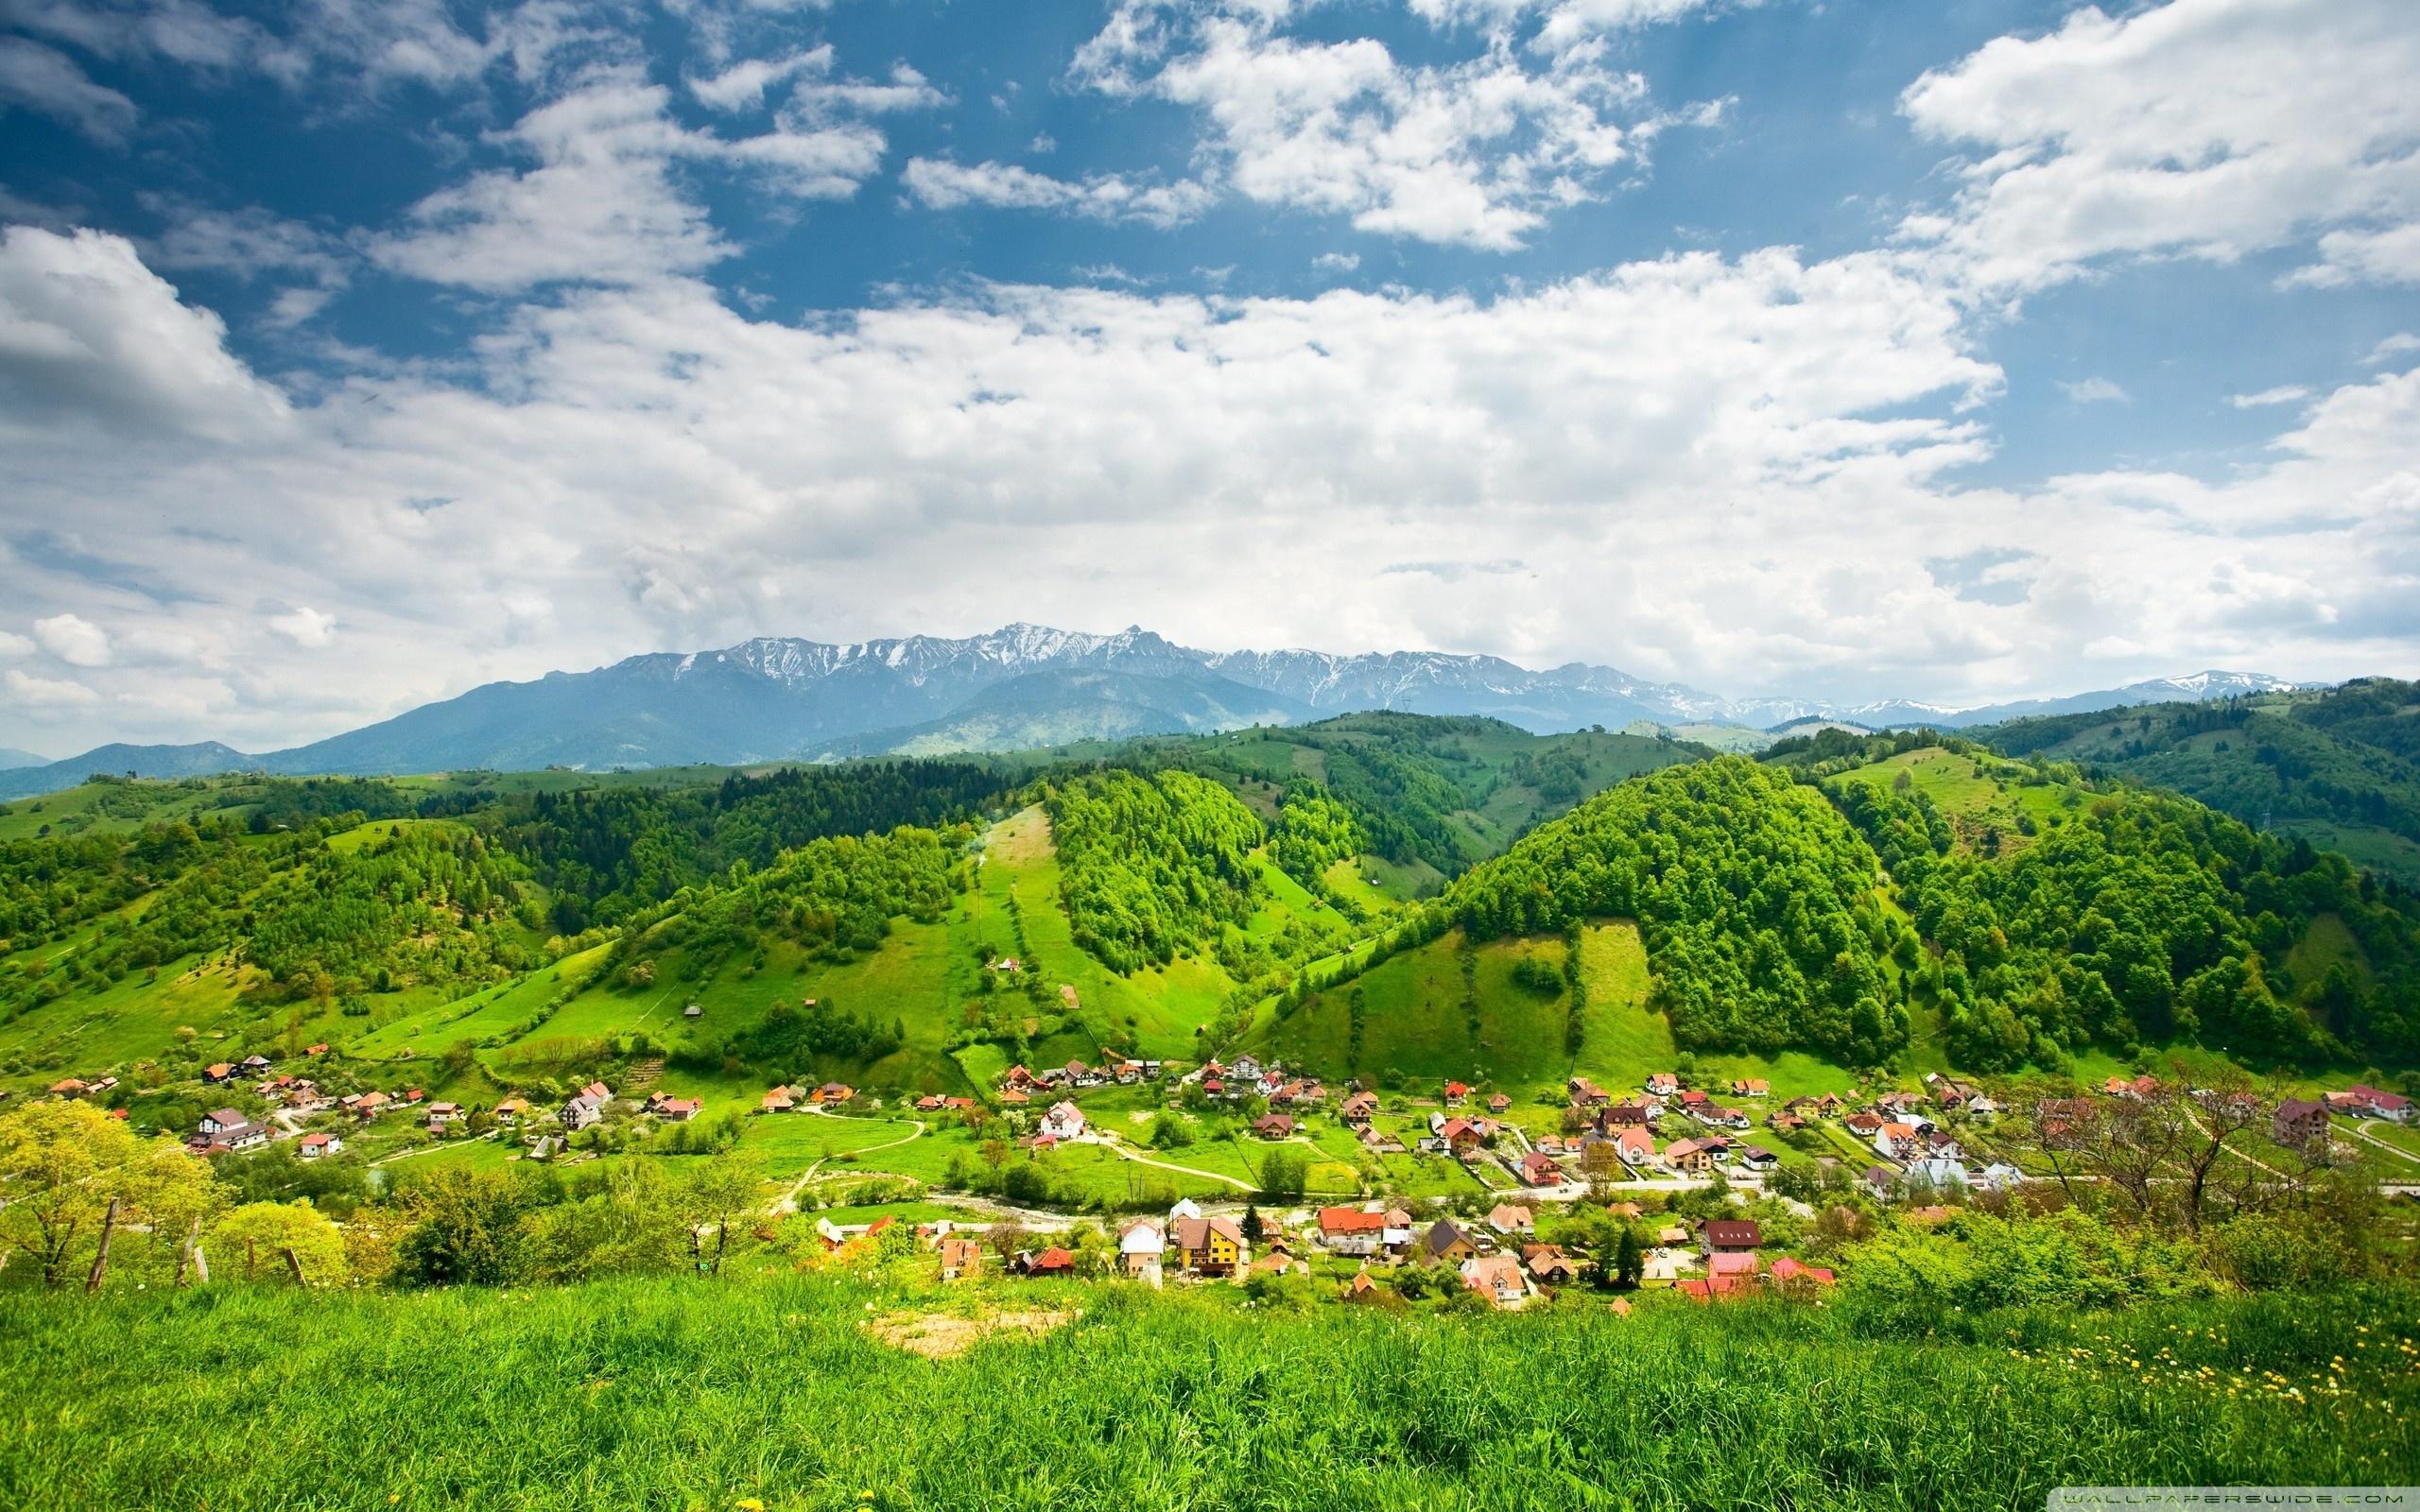 grass mountain village pic